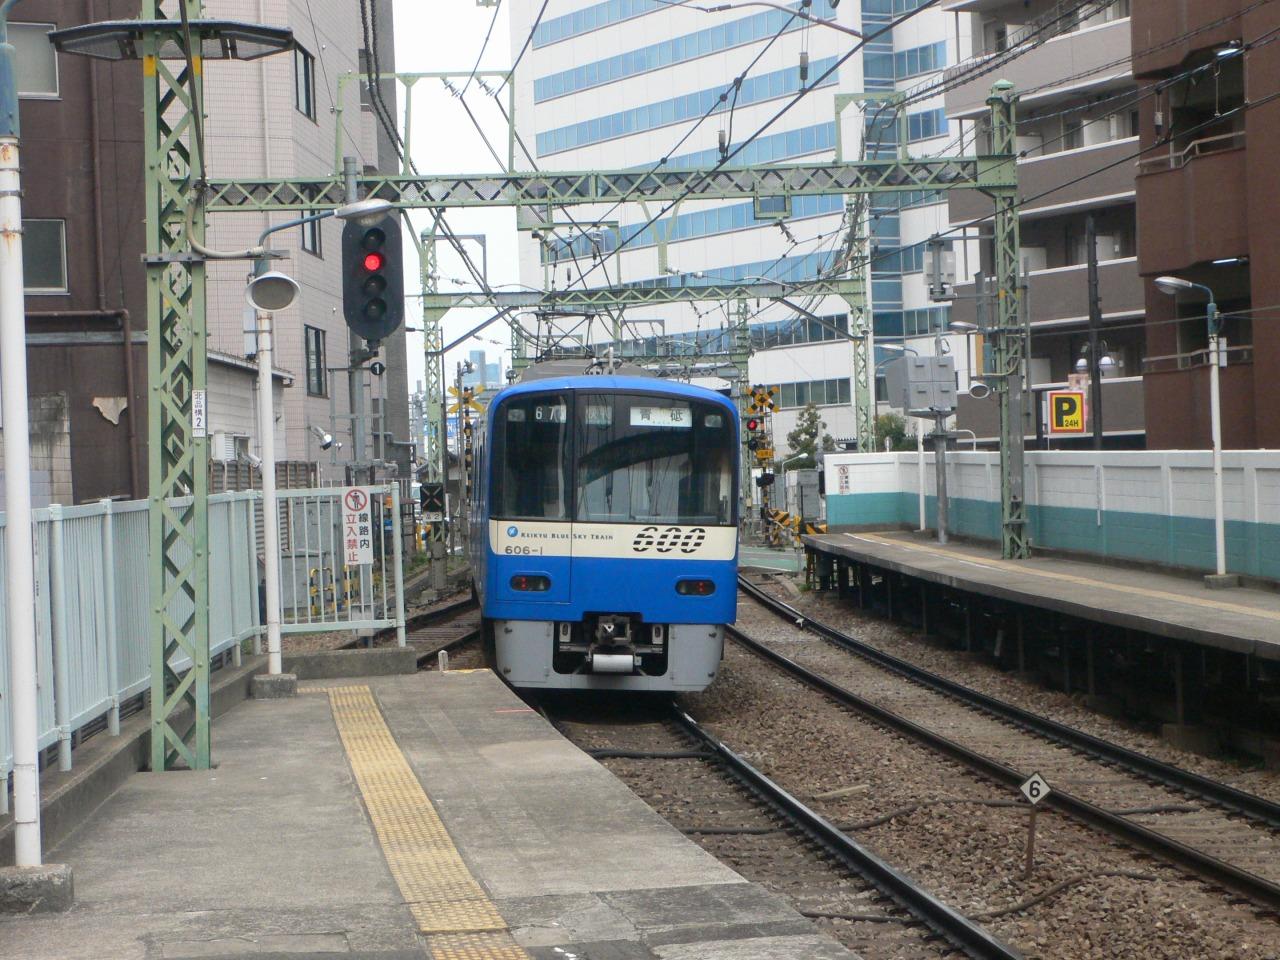 P1060079.jpg